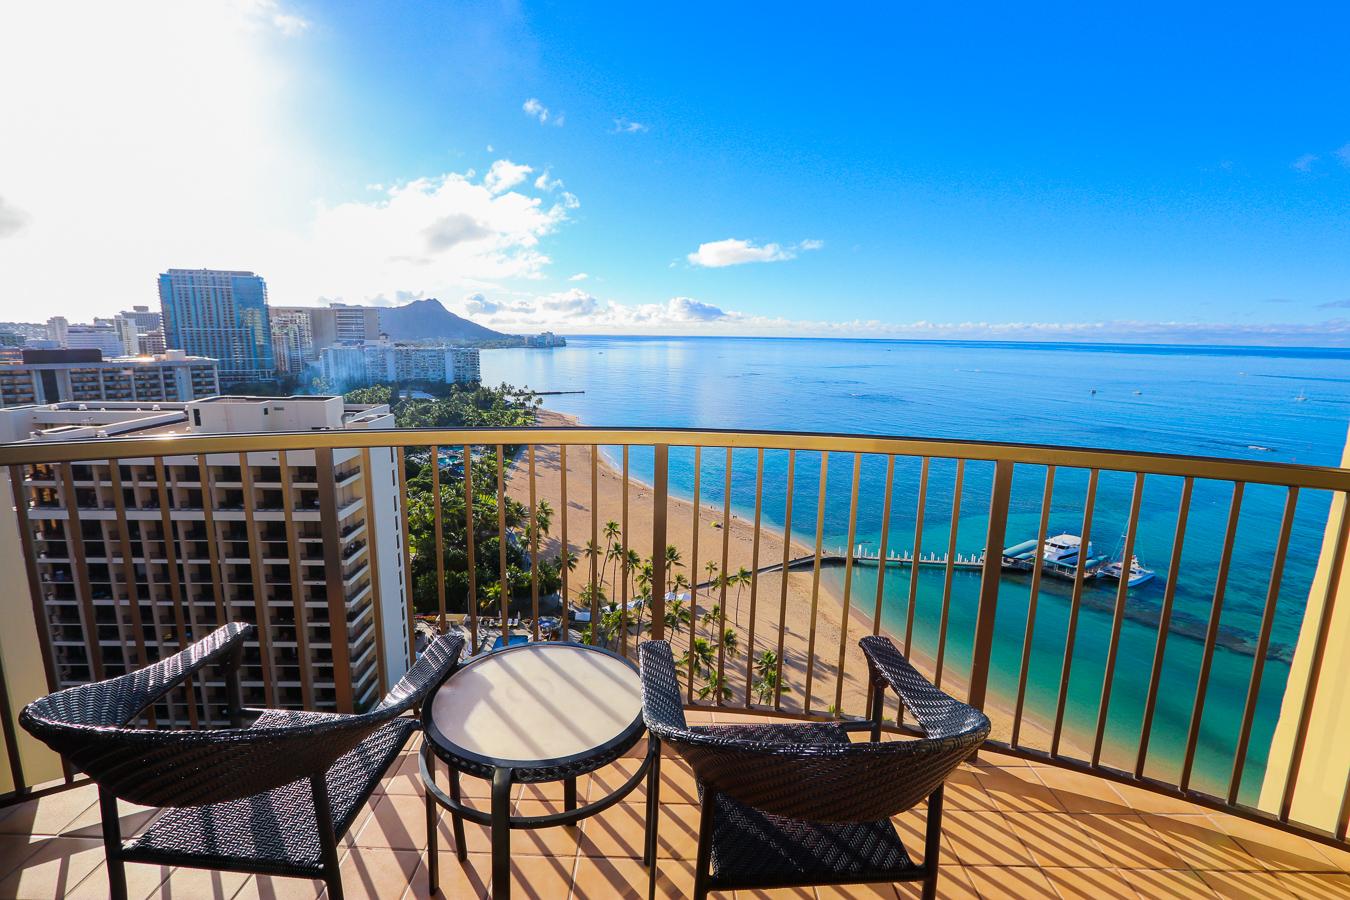 Review Hilton Hawaiian Village Full Resort And Rainbow